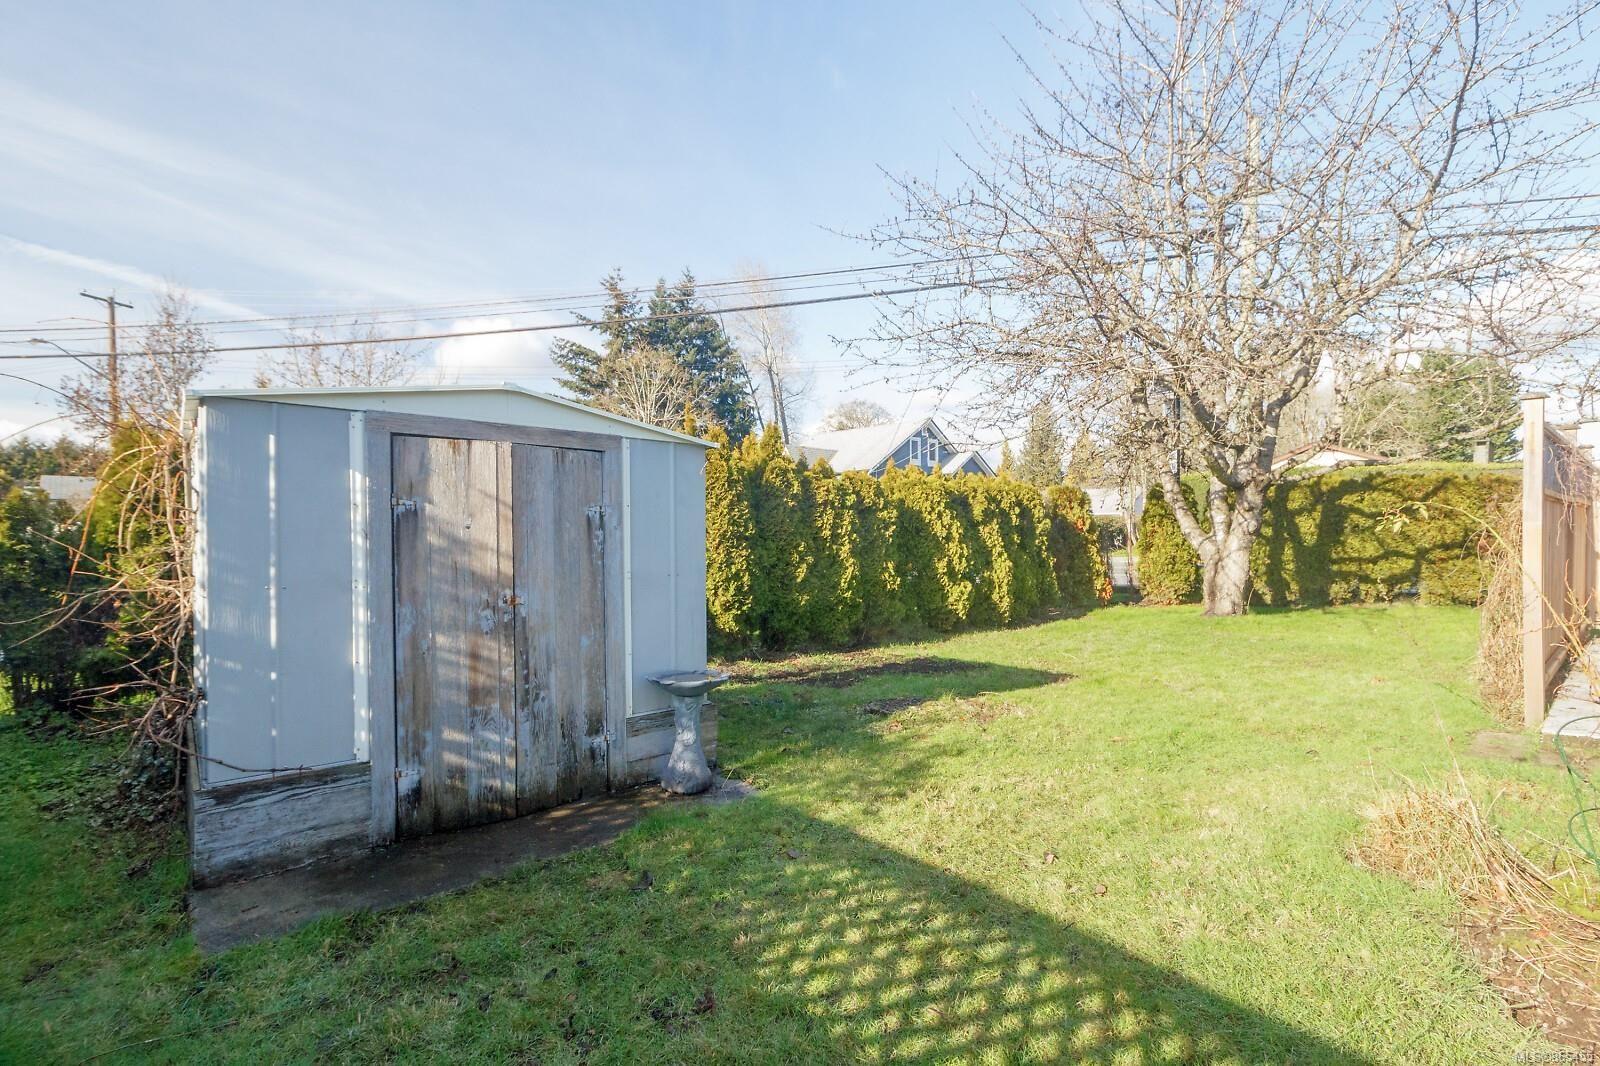 Photo 28: Photos: 399 Beech Ave in : Du East Duncan House for sale (Duncan)  : MLS®# 865455